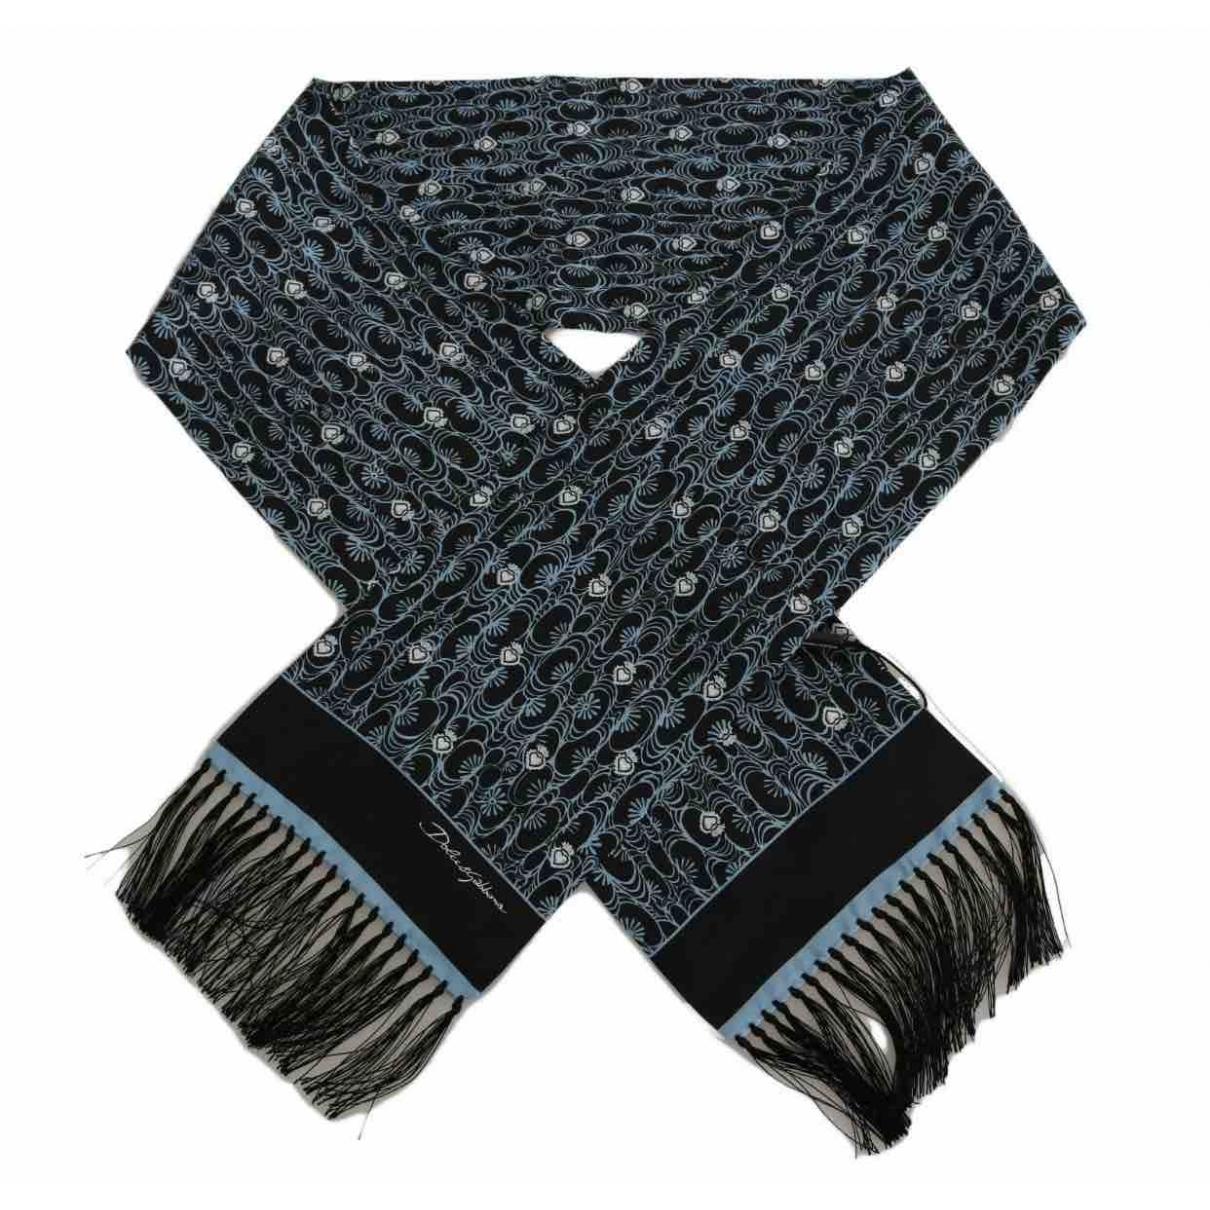 Dolce & Gabbana - Cheches.Echarpes   pour homme en soie - bleu